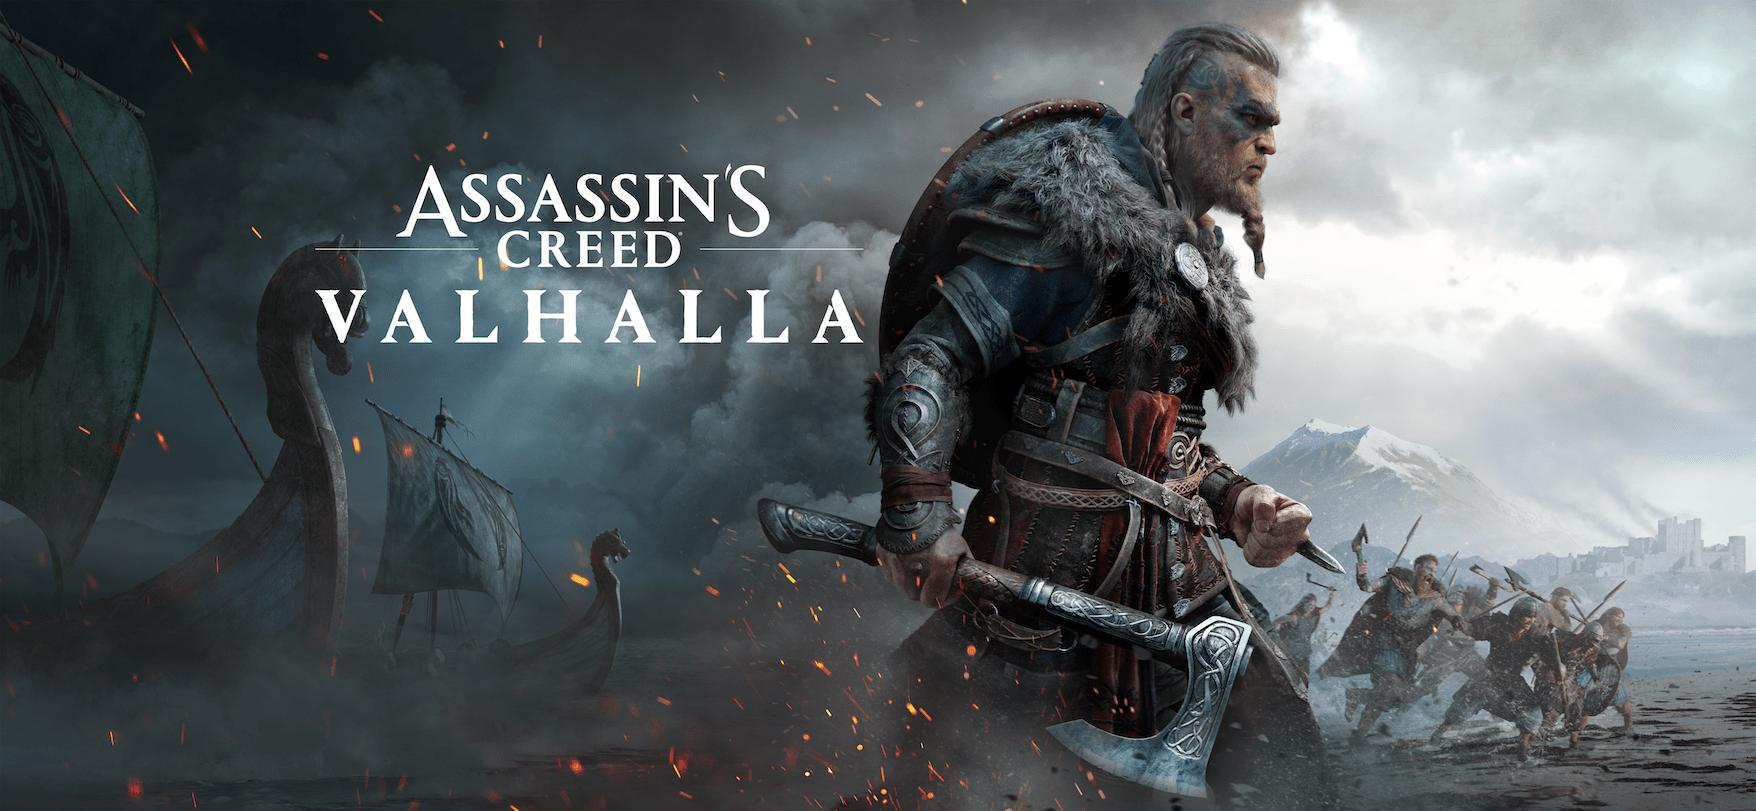 Imagen de Assassin's Creed Valhalla Eivor